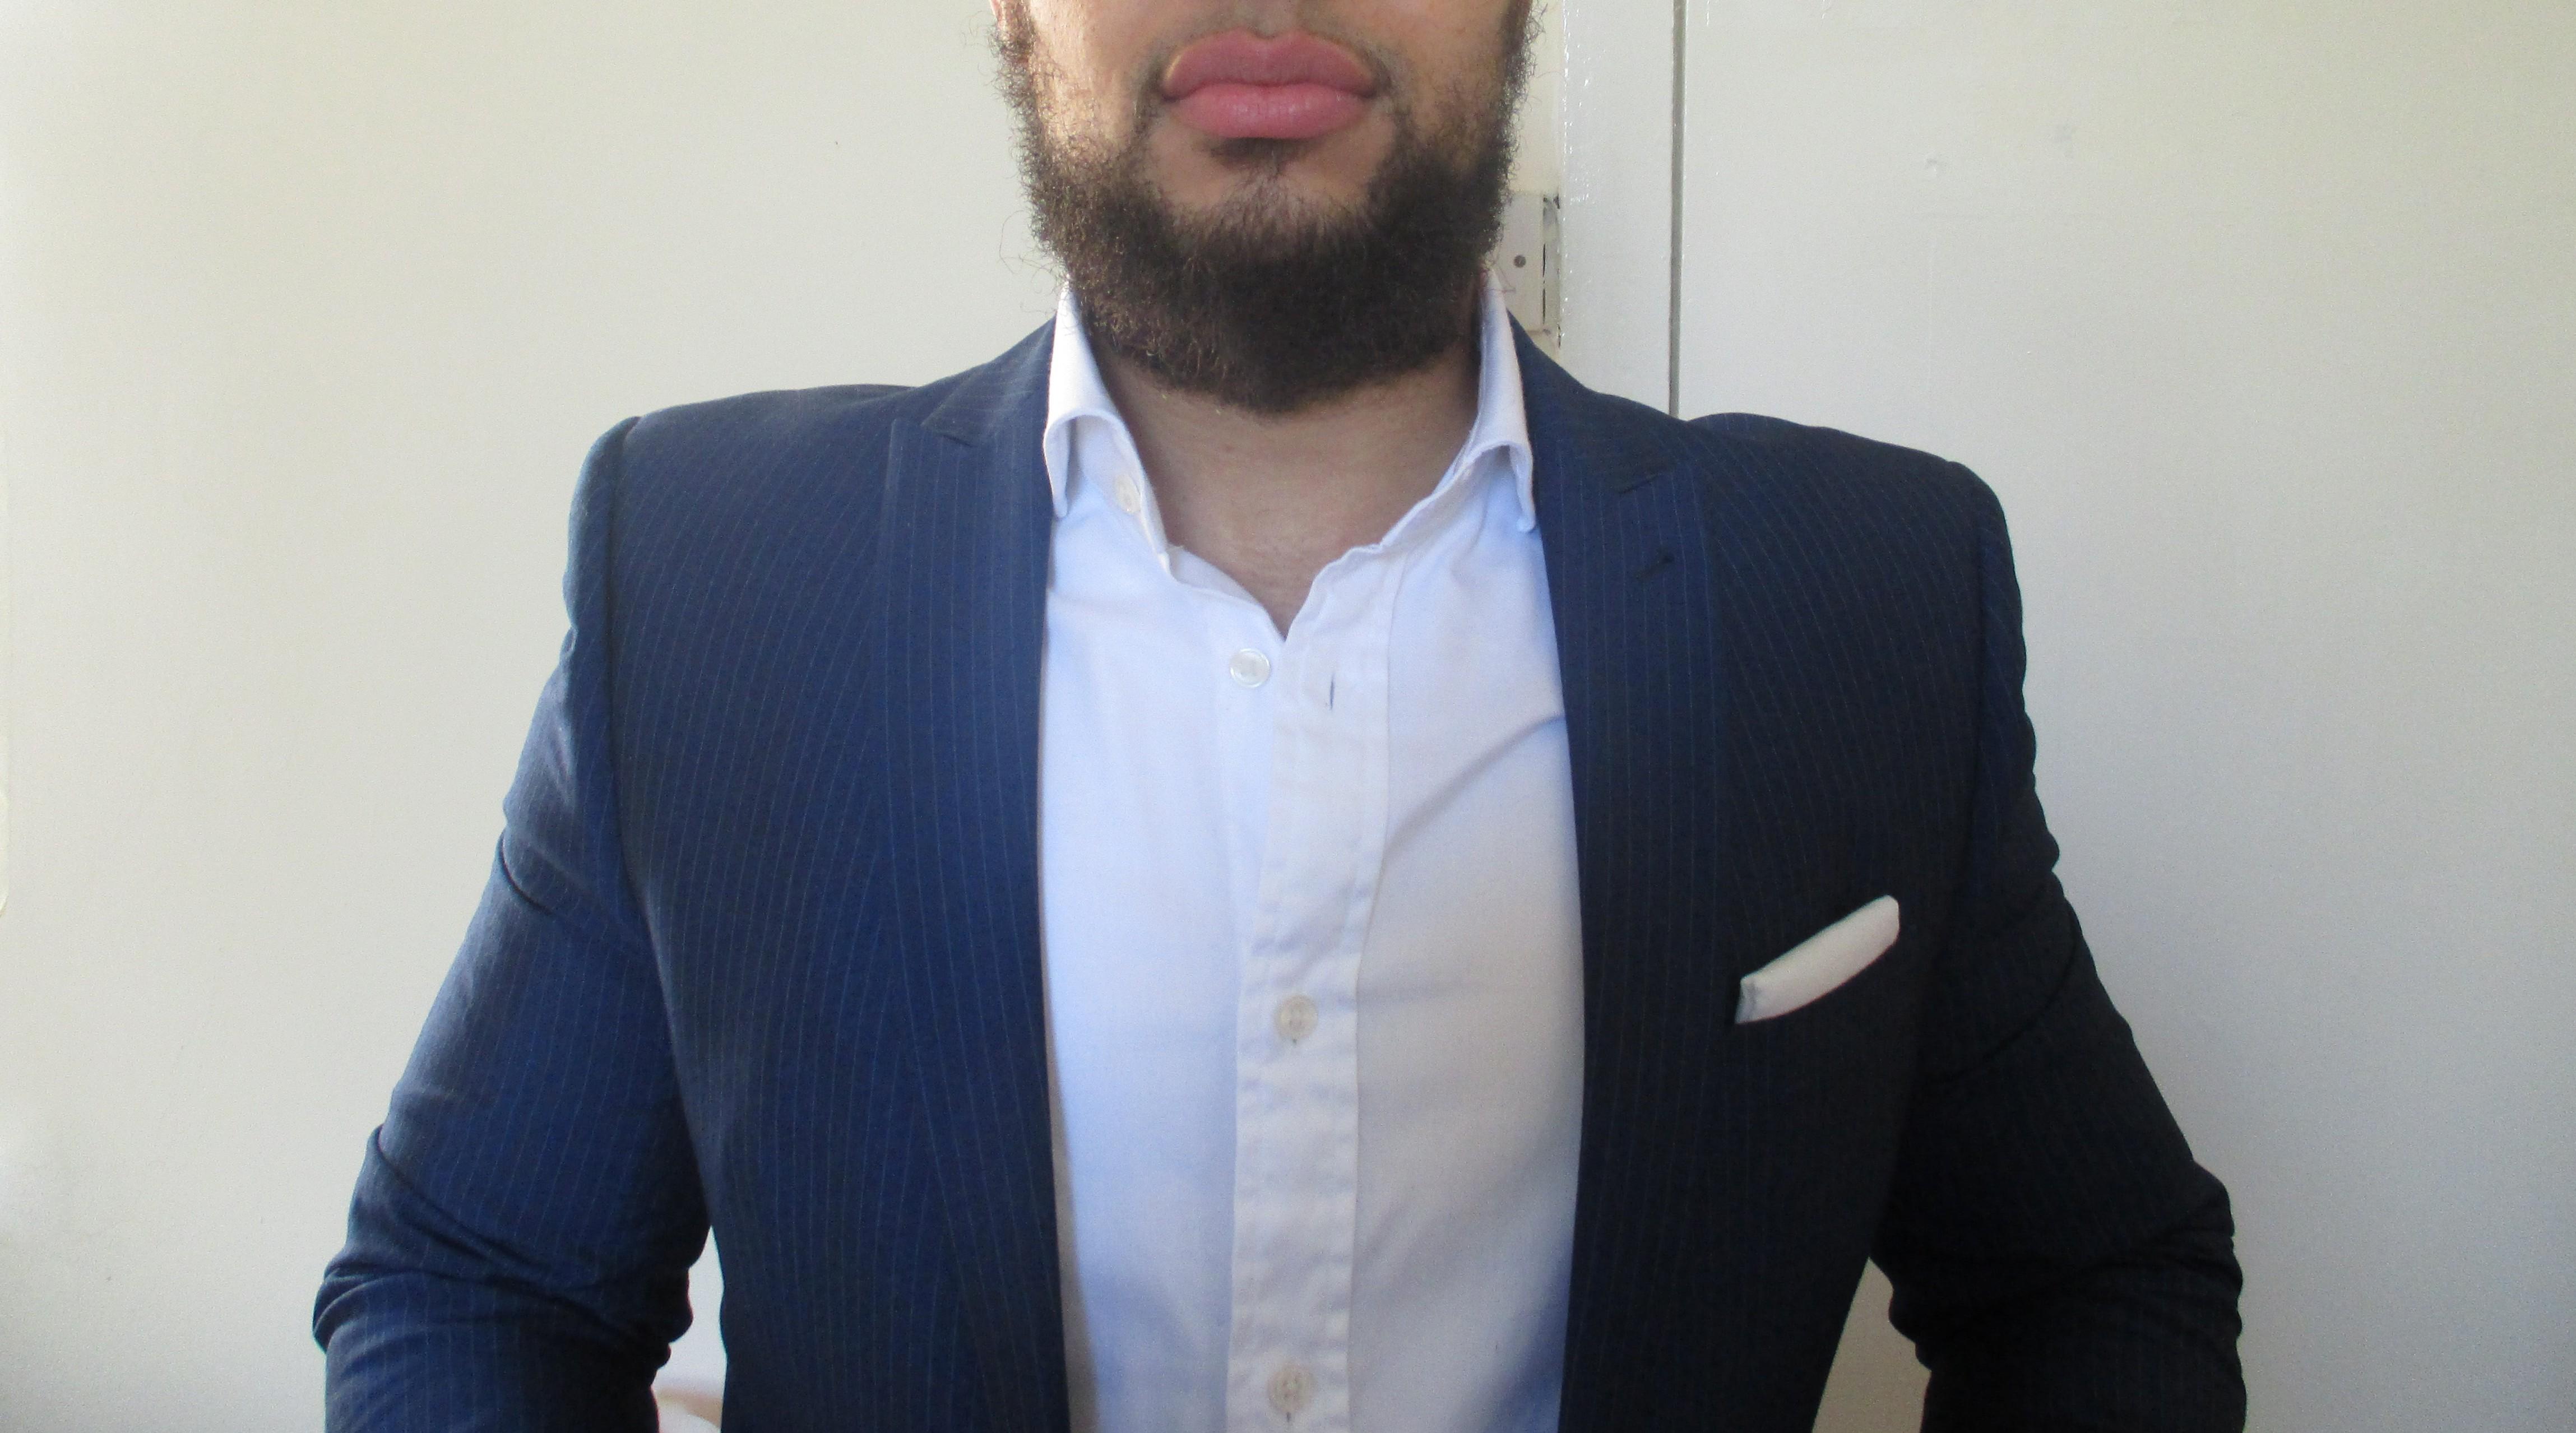 v neck & suit